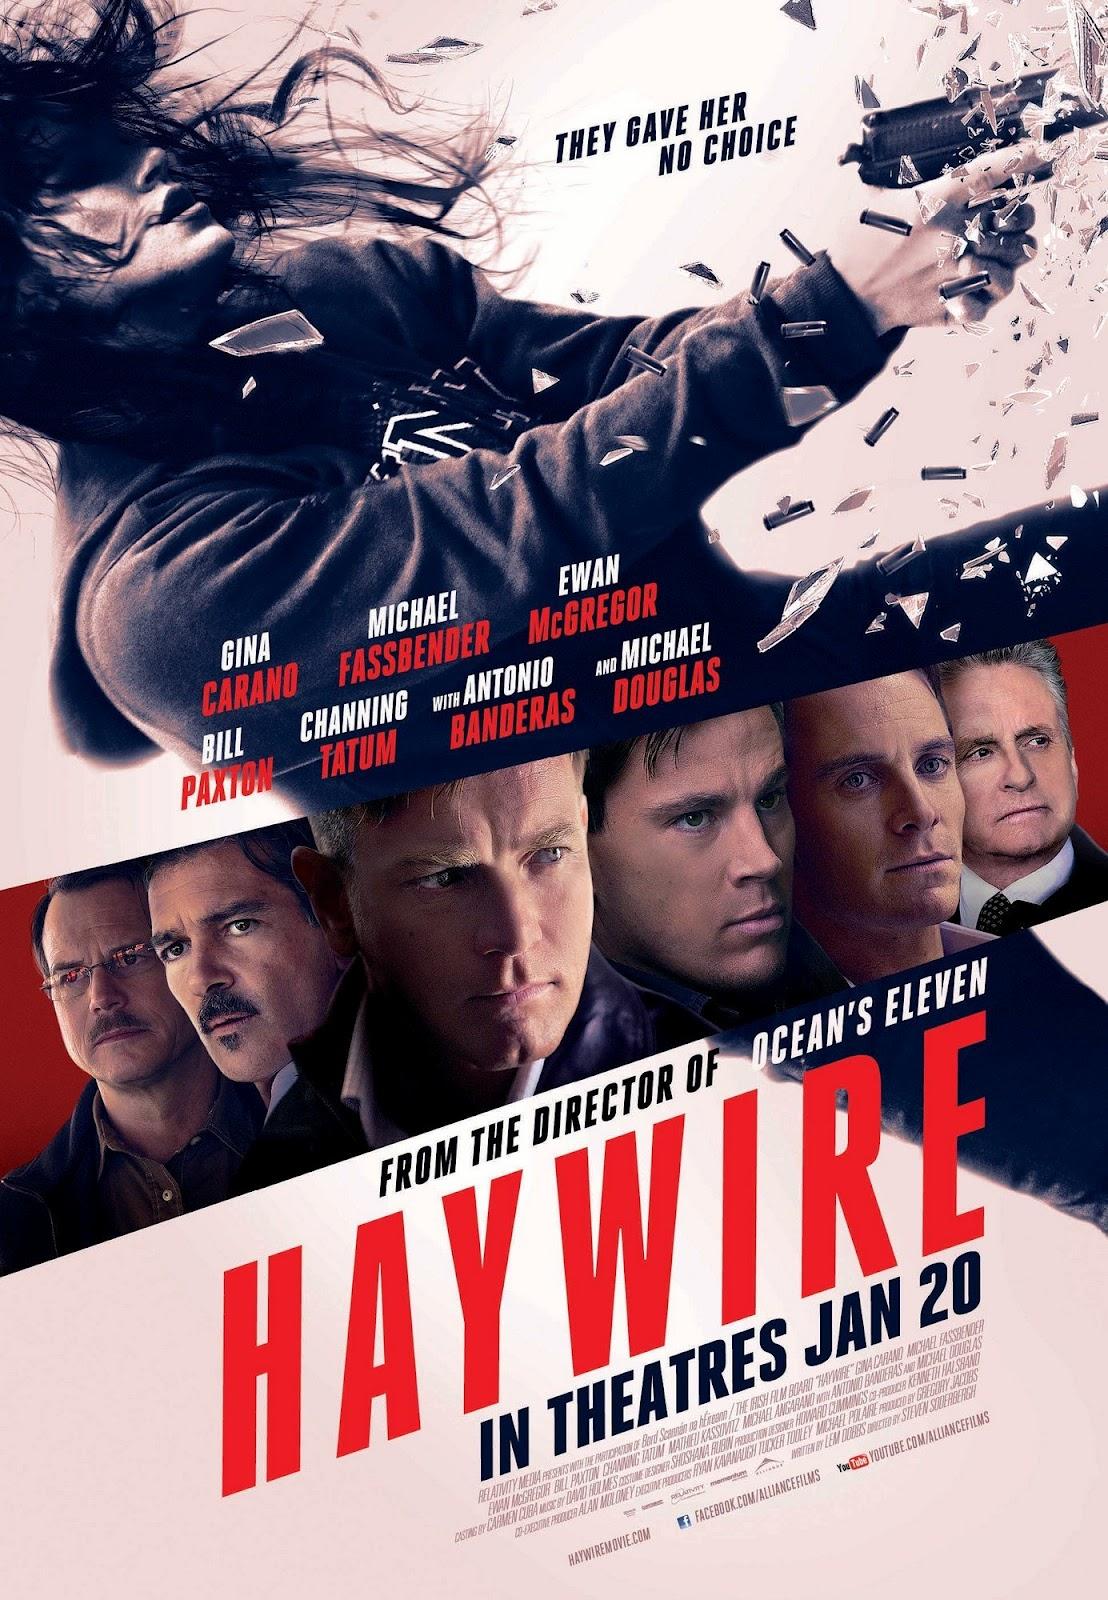 http://1.bp.blogspot.com/-fczTf3k67BE/Tzc53VLo7VI/AAAAAAAAAFA/DWwPs7cvdBg/s1600/haywire-poster04.jpg